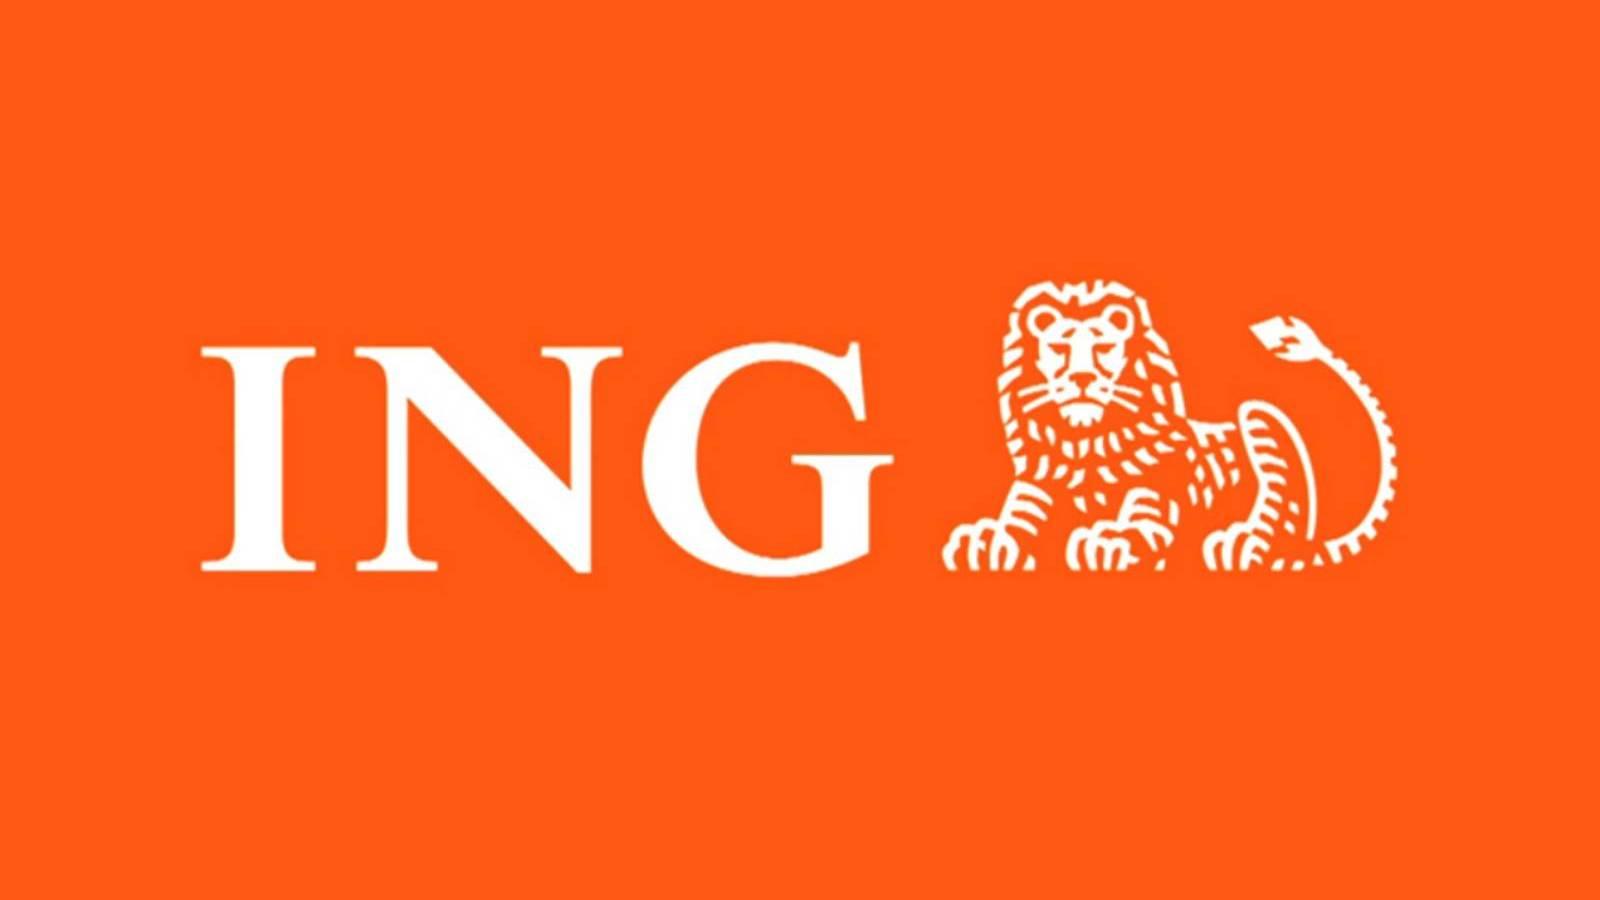 ING Bank restrictionare